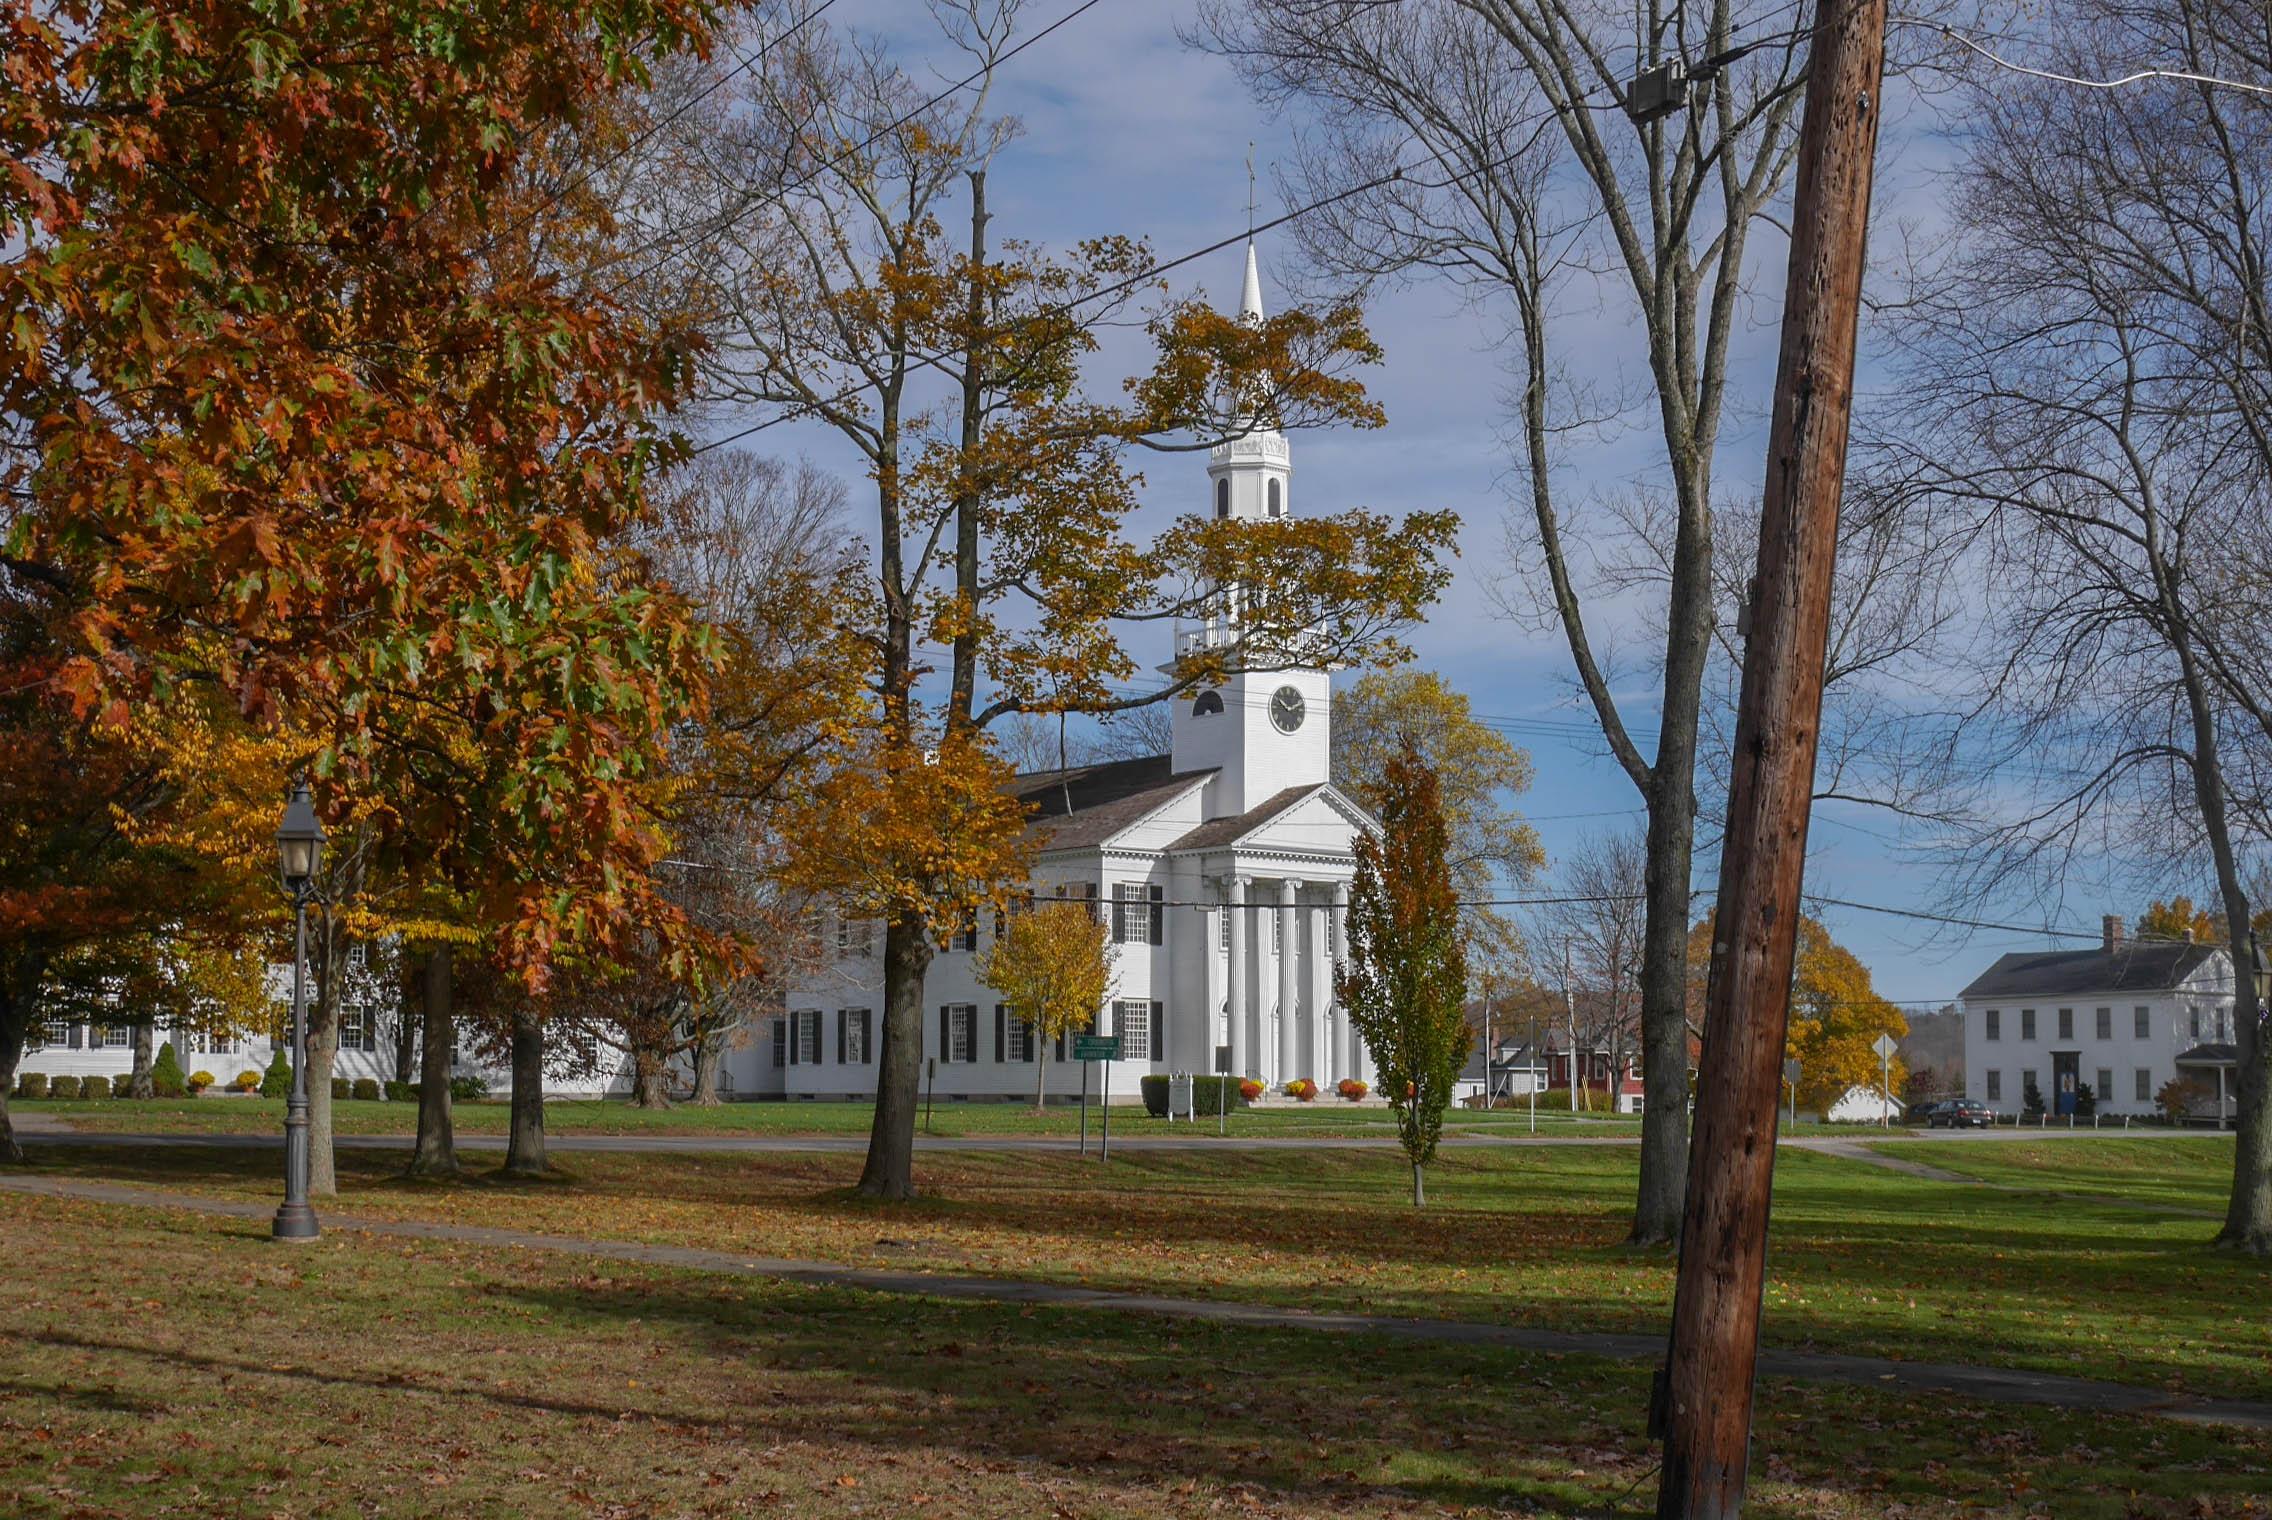 The Litchfield Green - Litchfield, CT